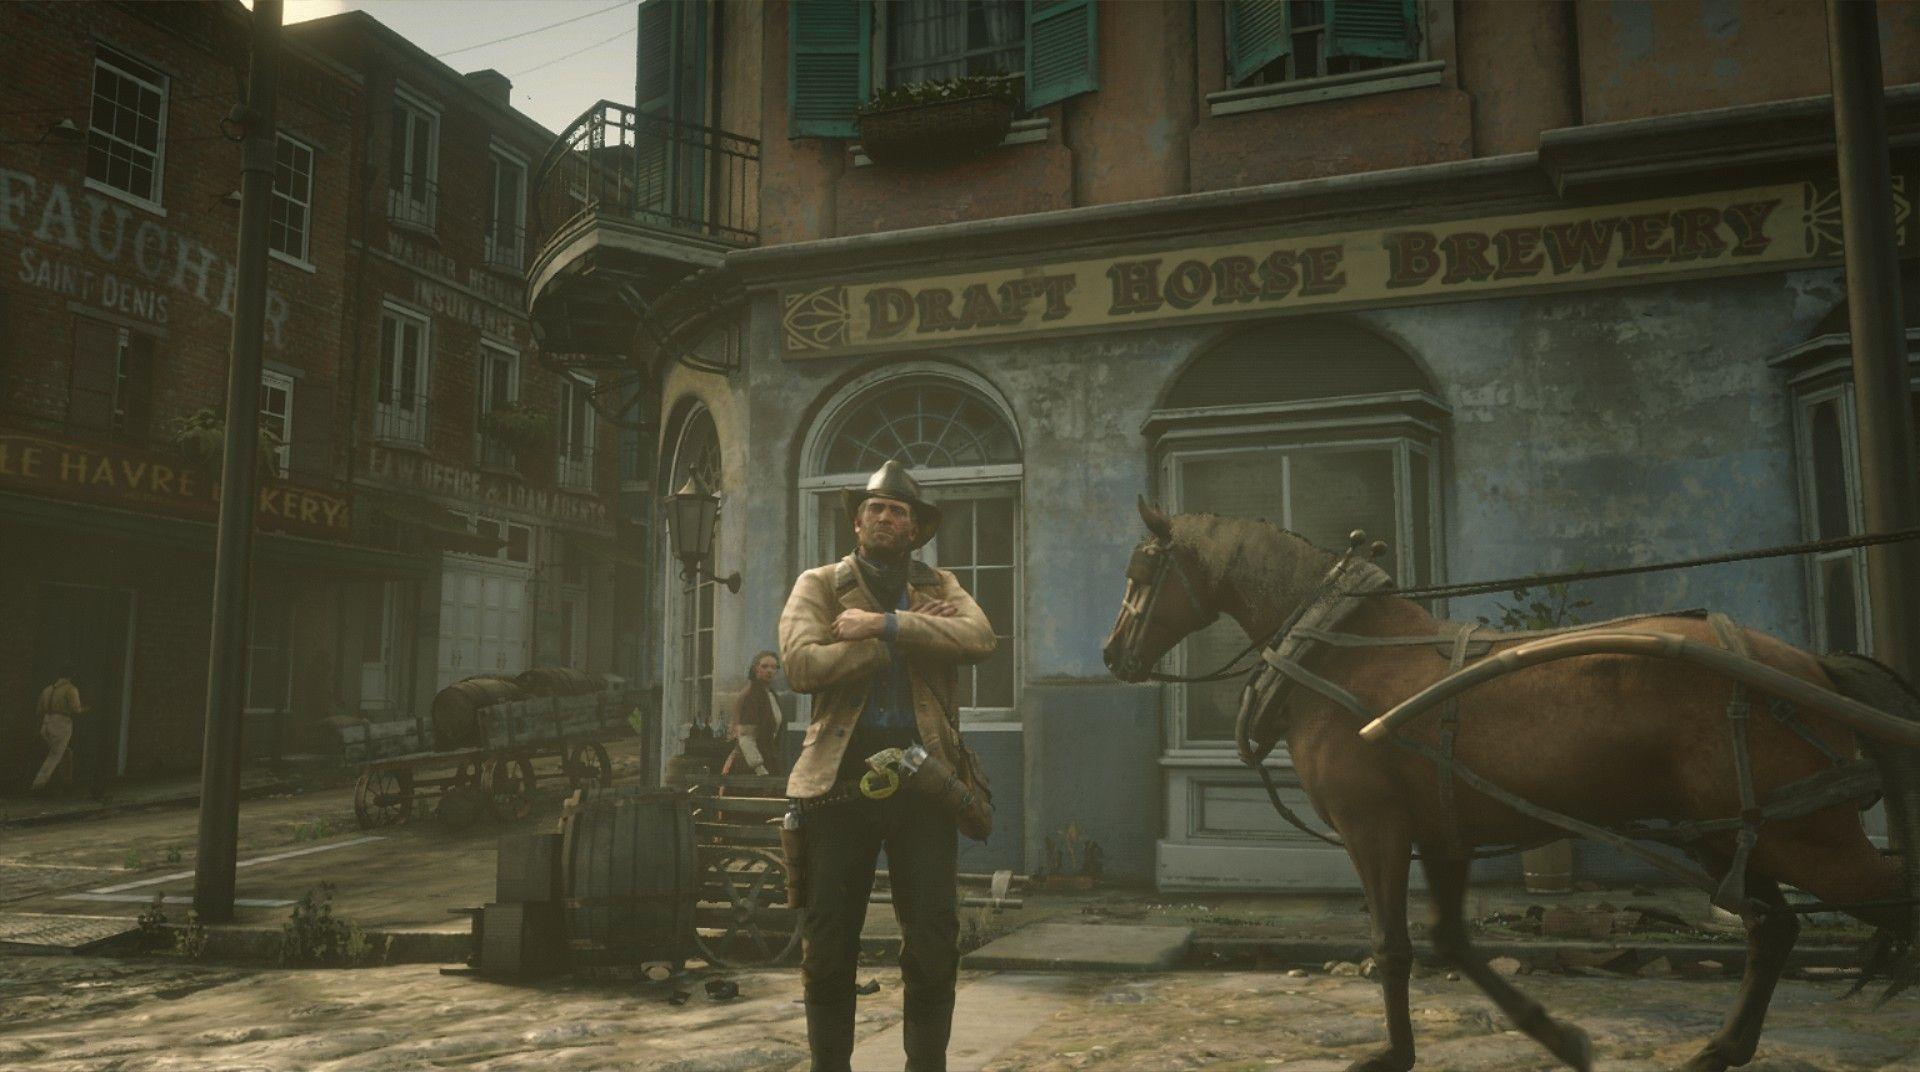 Red Dead Redemption 2 Xbox One Einrib13 Arthur Morgan Outsjde Draft Horse Brewery In Sain Red Dead Redemption Red Dead Redemption Ii Red Dead Redemption 1